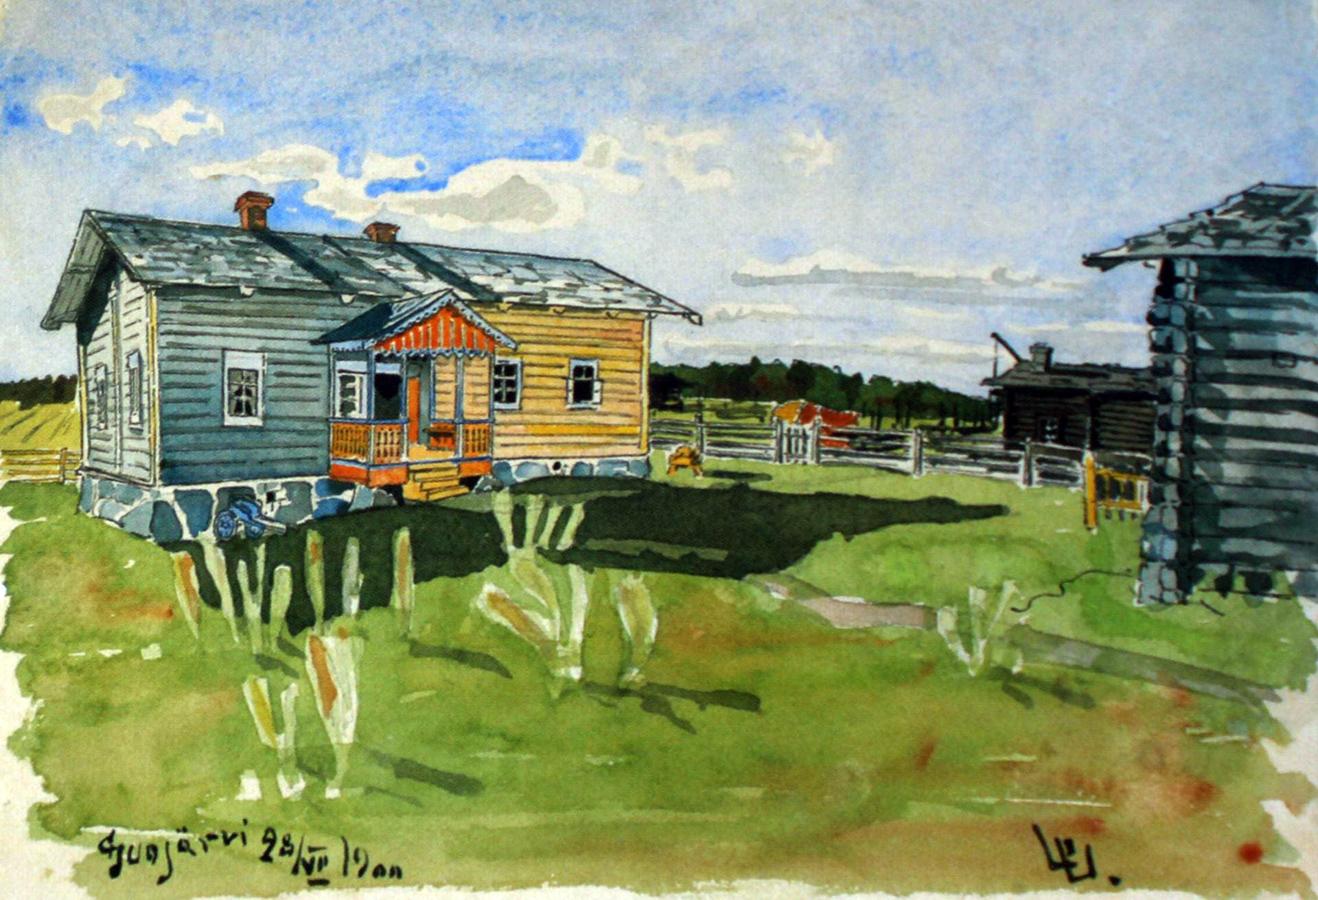 July 28, 1900. Suojärvi